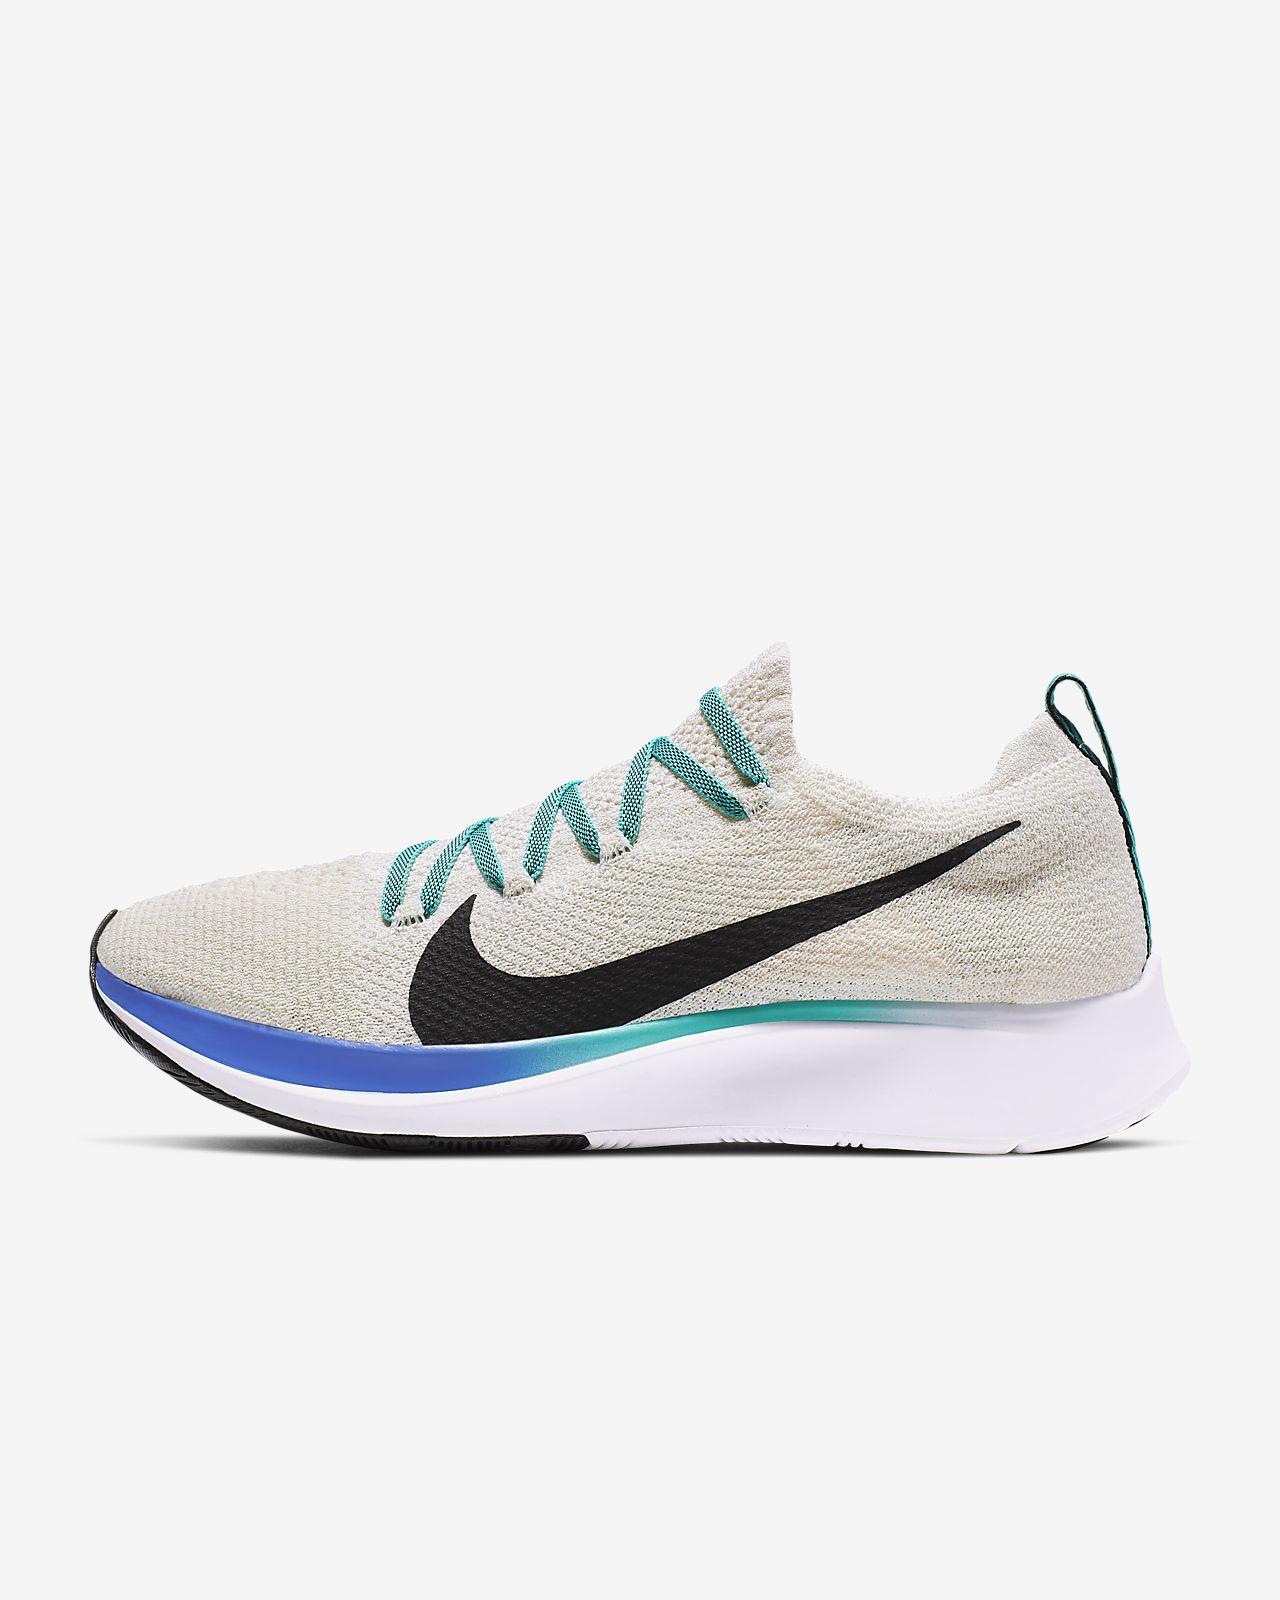 online retailer efc4b 22160 ... Chaussure de running Nike Zoom Fly Flyknit pour Femme